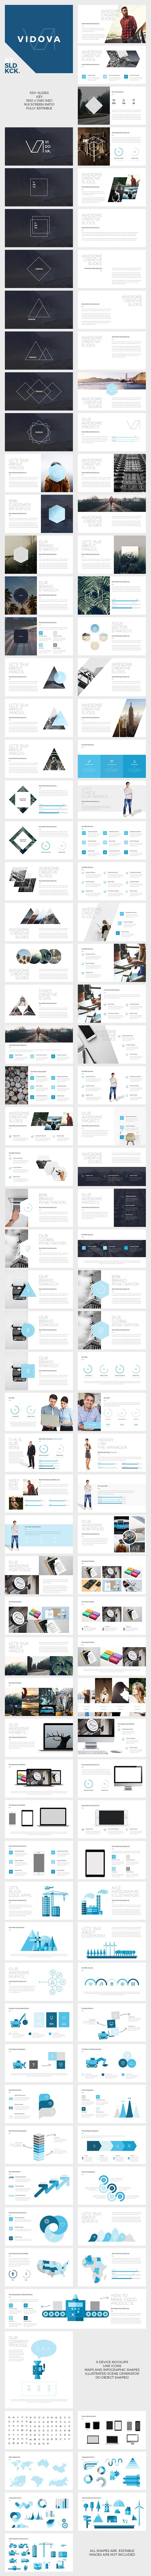 VIDOVA - Modern Keynote Presentation — Keynote KEY #corporate #pptx • Available here → https://graphicriver.net/item/vidova-modern-keynote-presentation/15626390?ref=pxcr